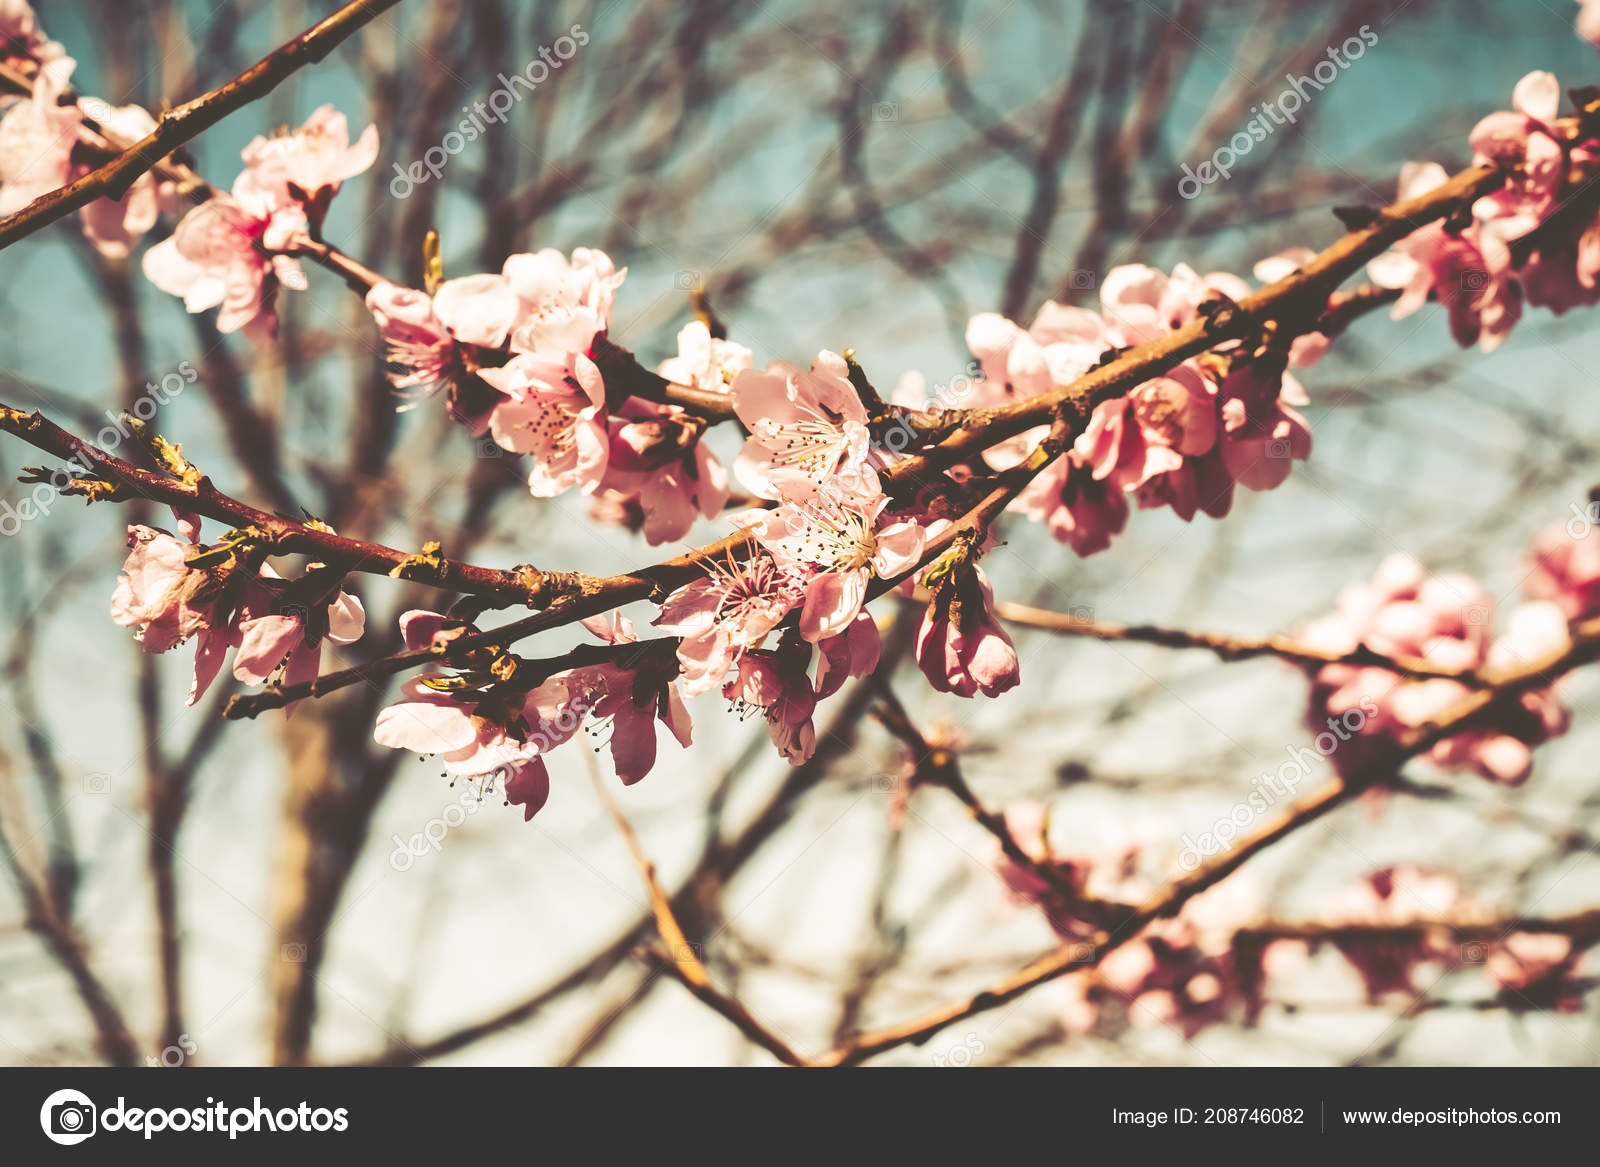 Cherry tree branch bud in bloom background as a beautiful spring cherry tree branch bud in bloom background as a beautiful spring flower stock photo mightylinksfo